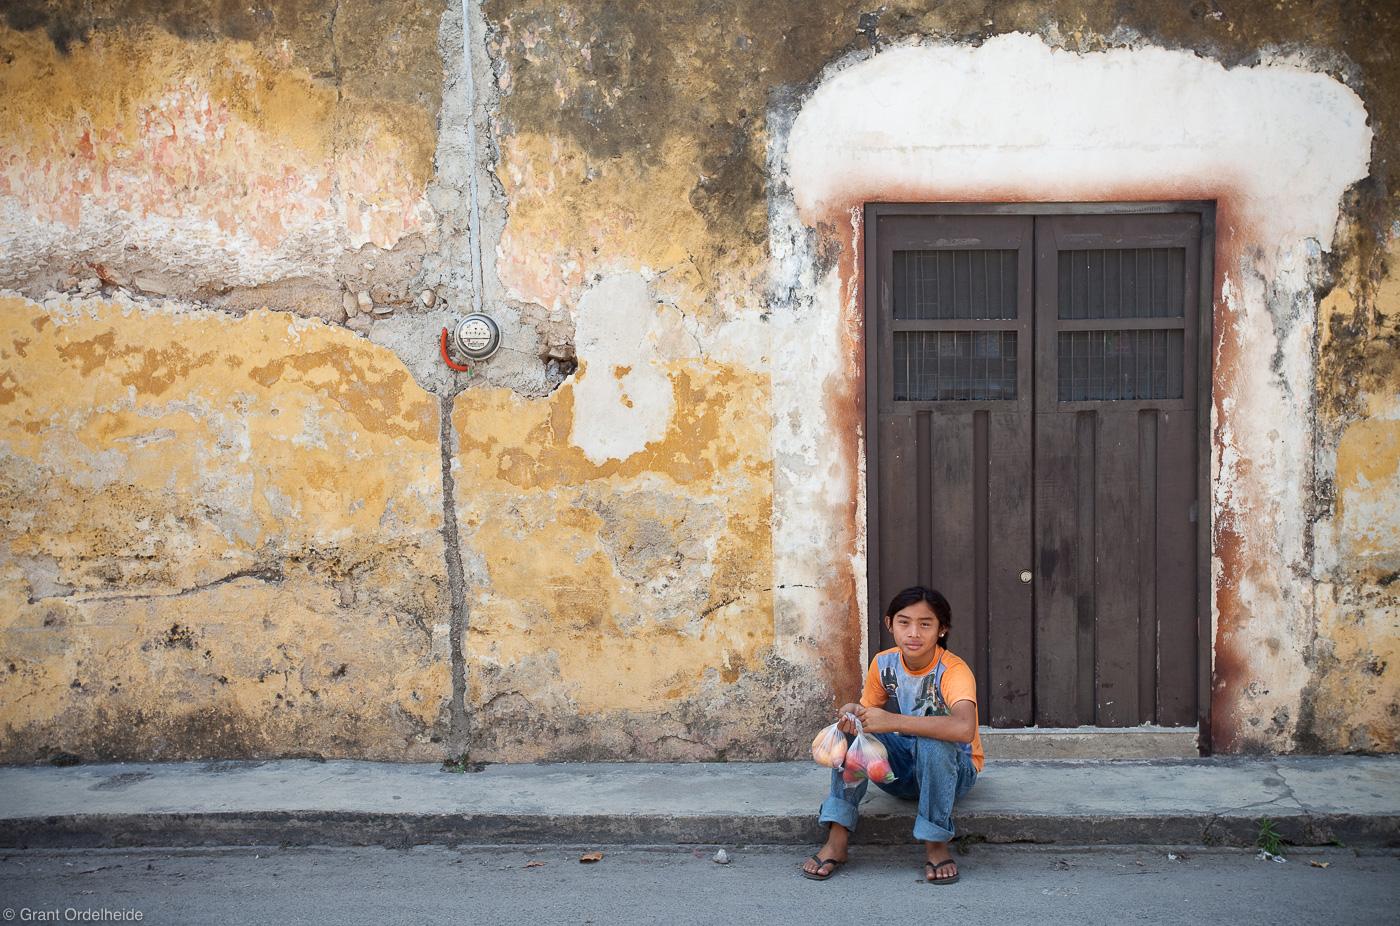 izamal, mexico, yucatan, young boy, old, decrepit, wall,, photo